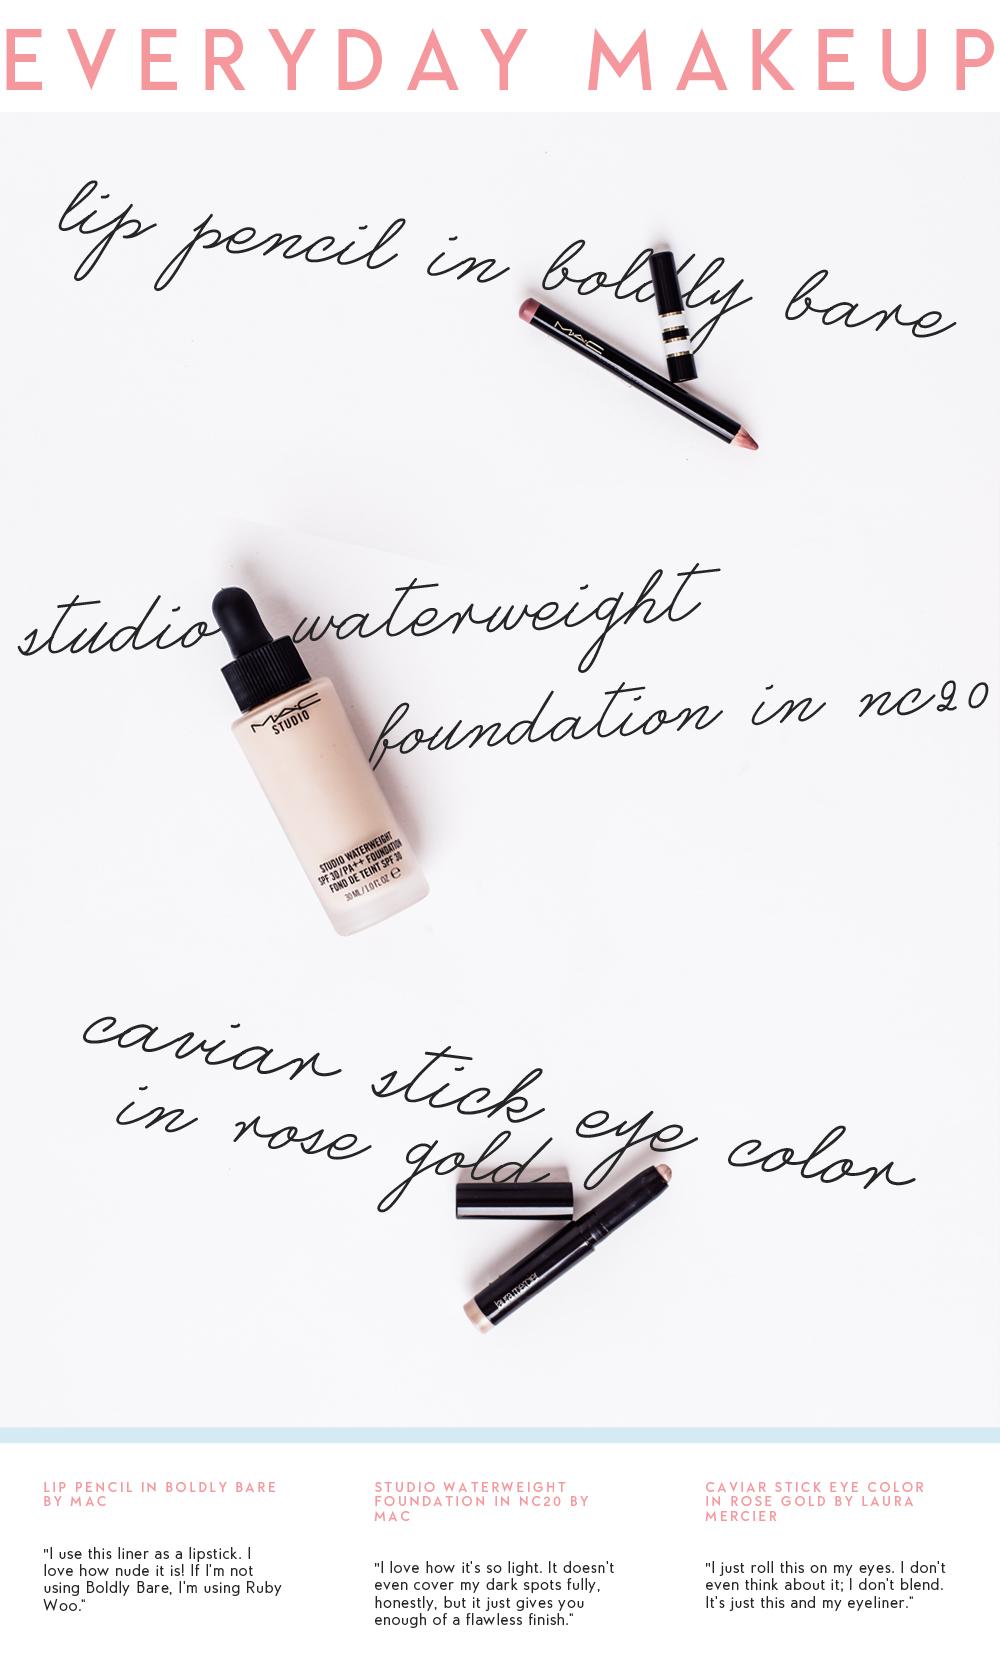 products-alyssa-lapid-megastyle-megastyleph-everyday-makeup